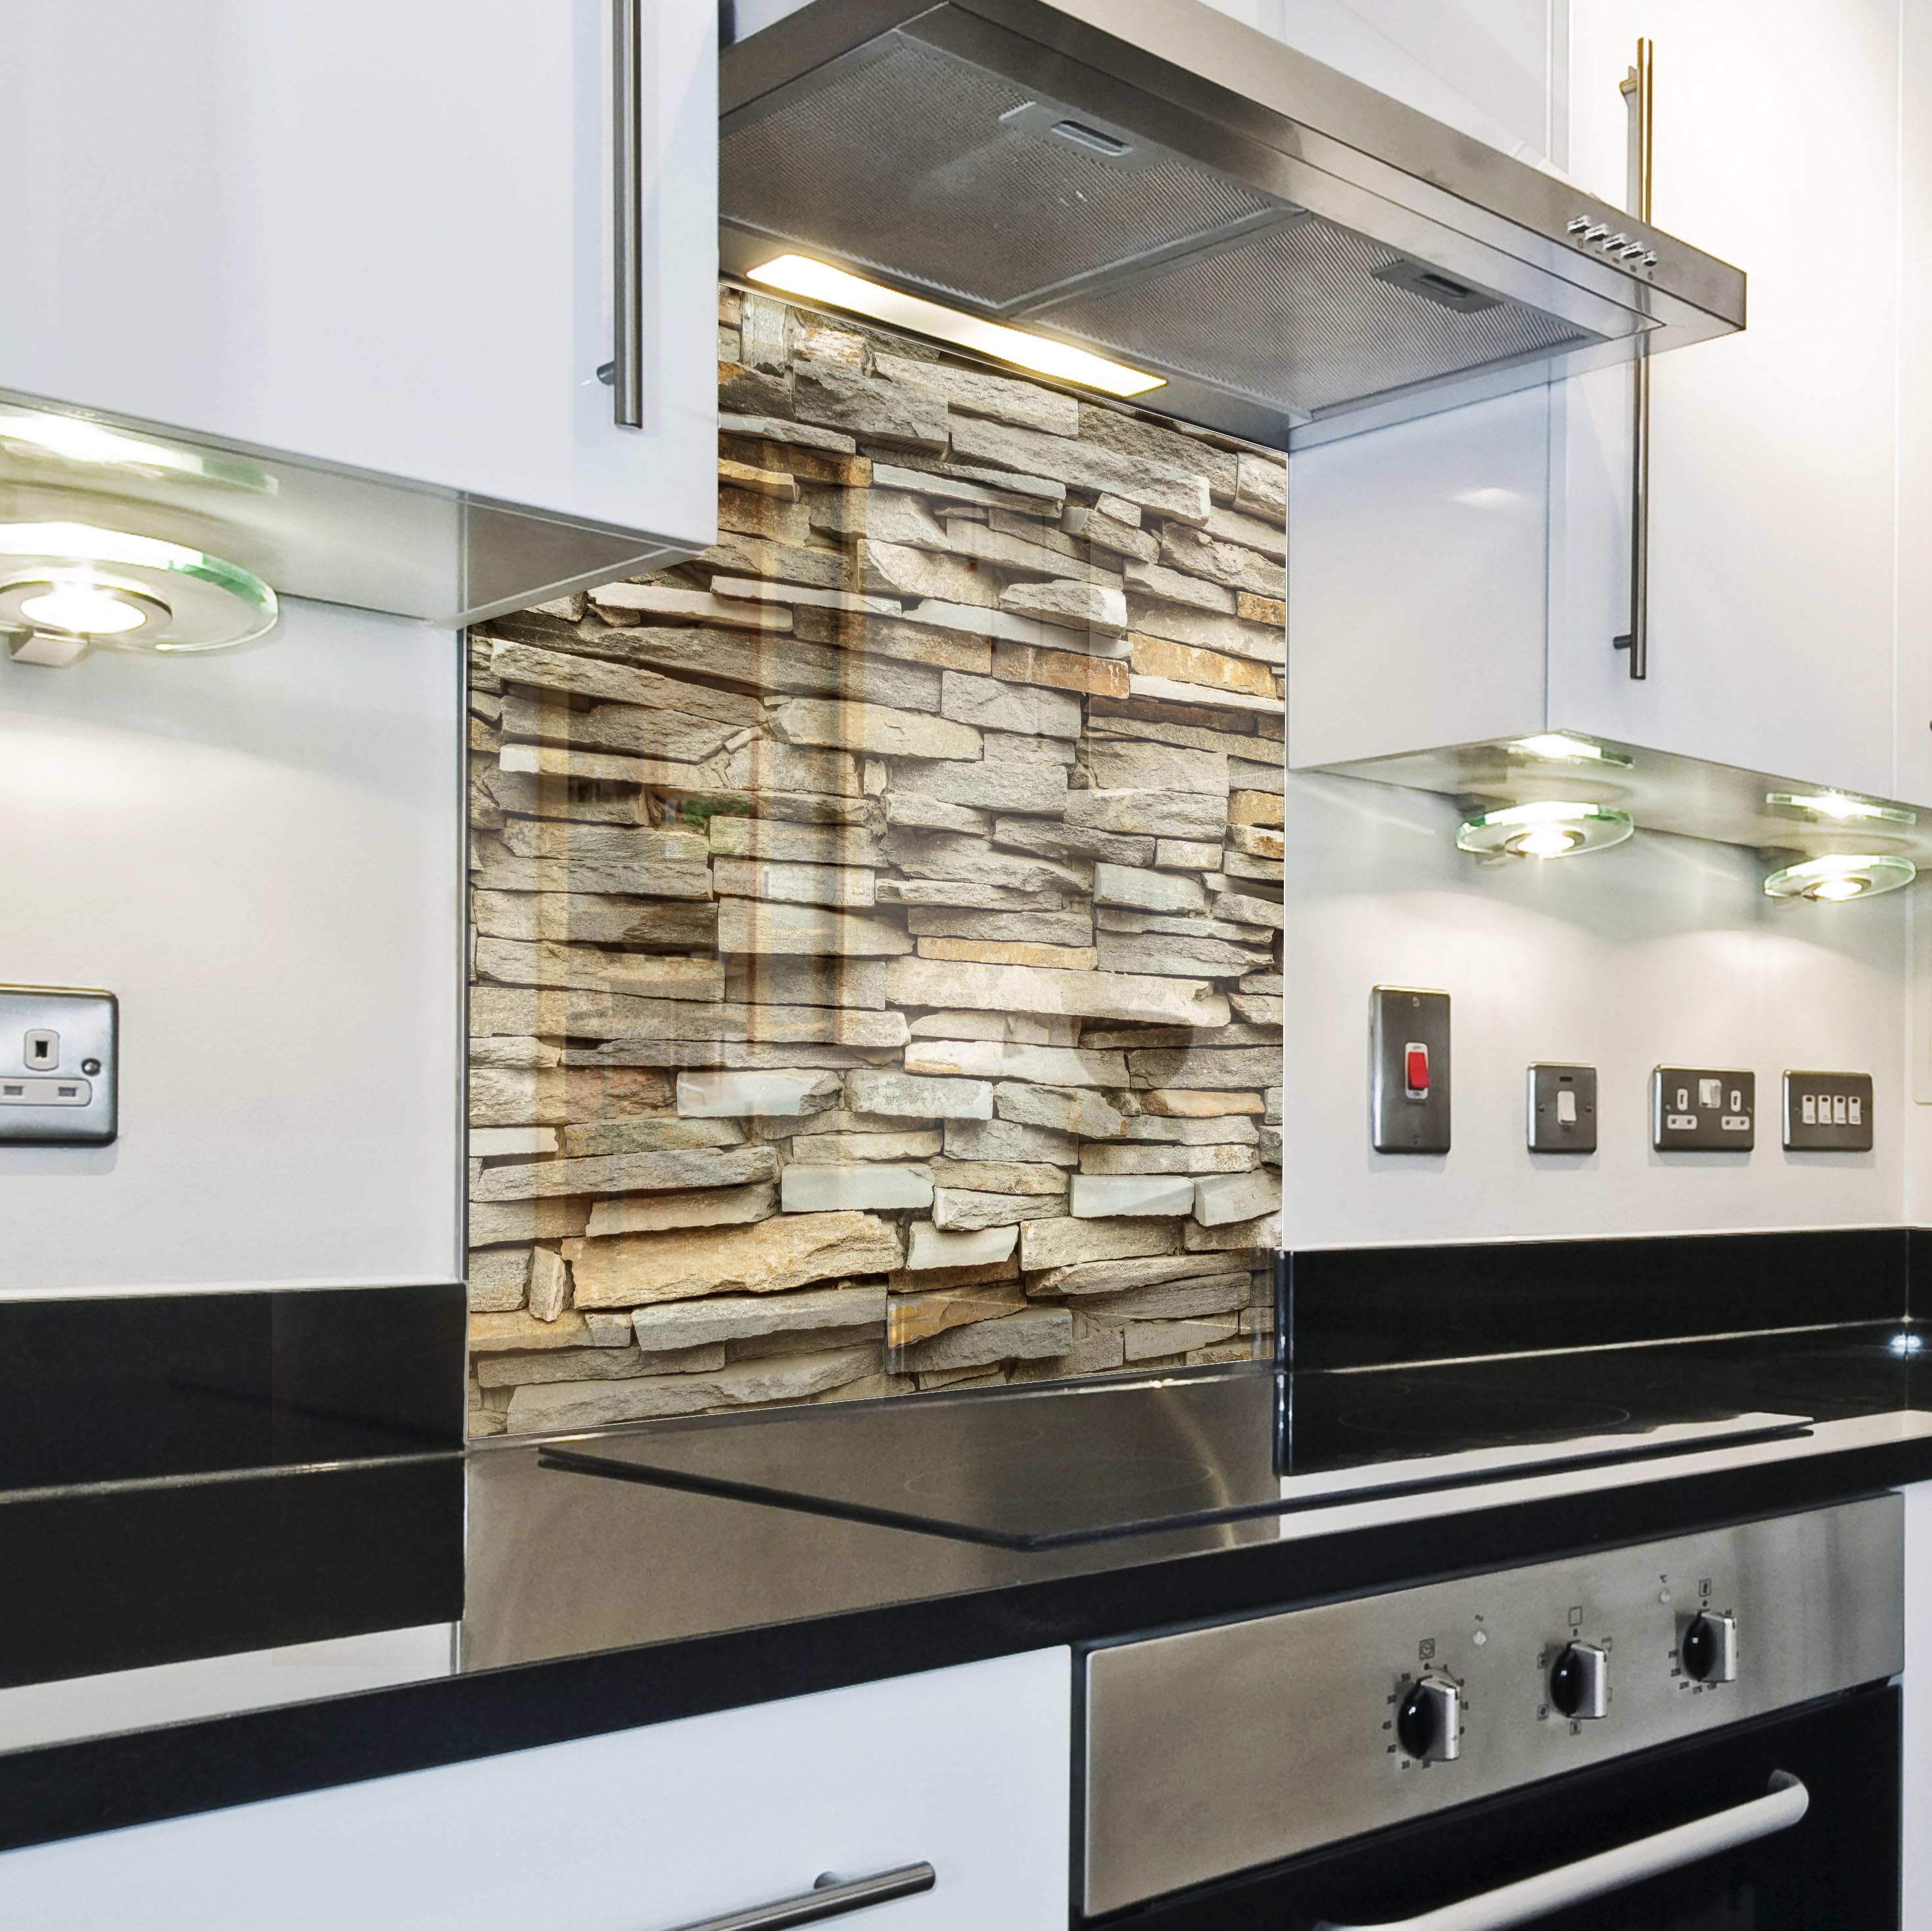 Splashback paraschizzi paraspruzzi rivestimento cucina for Piastrelle paraspruzzi cucina